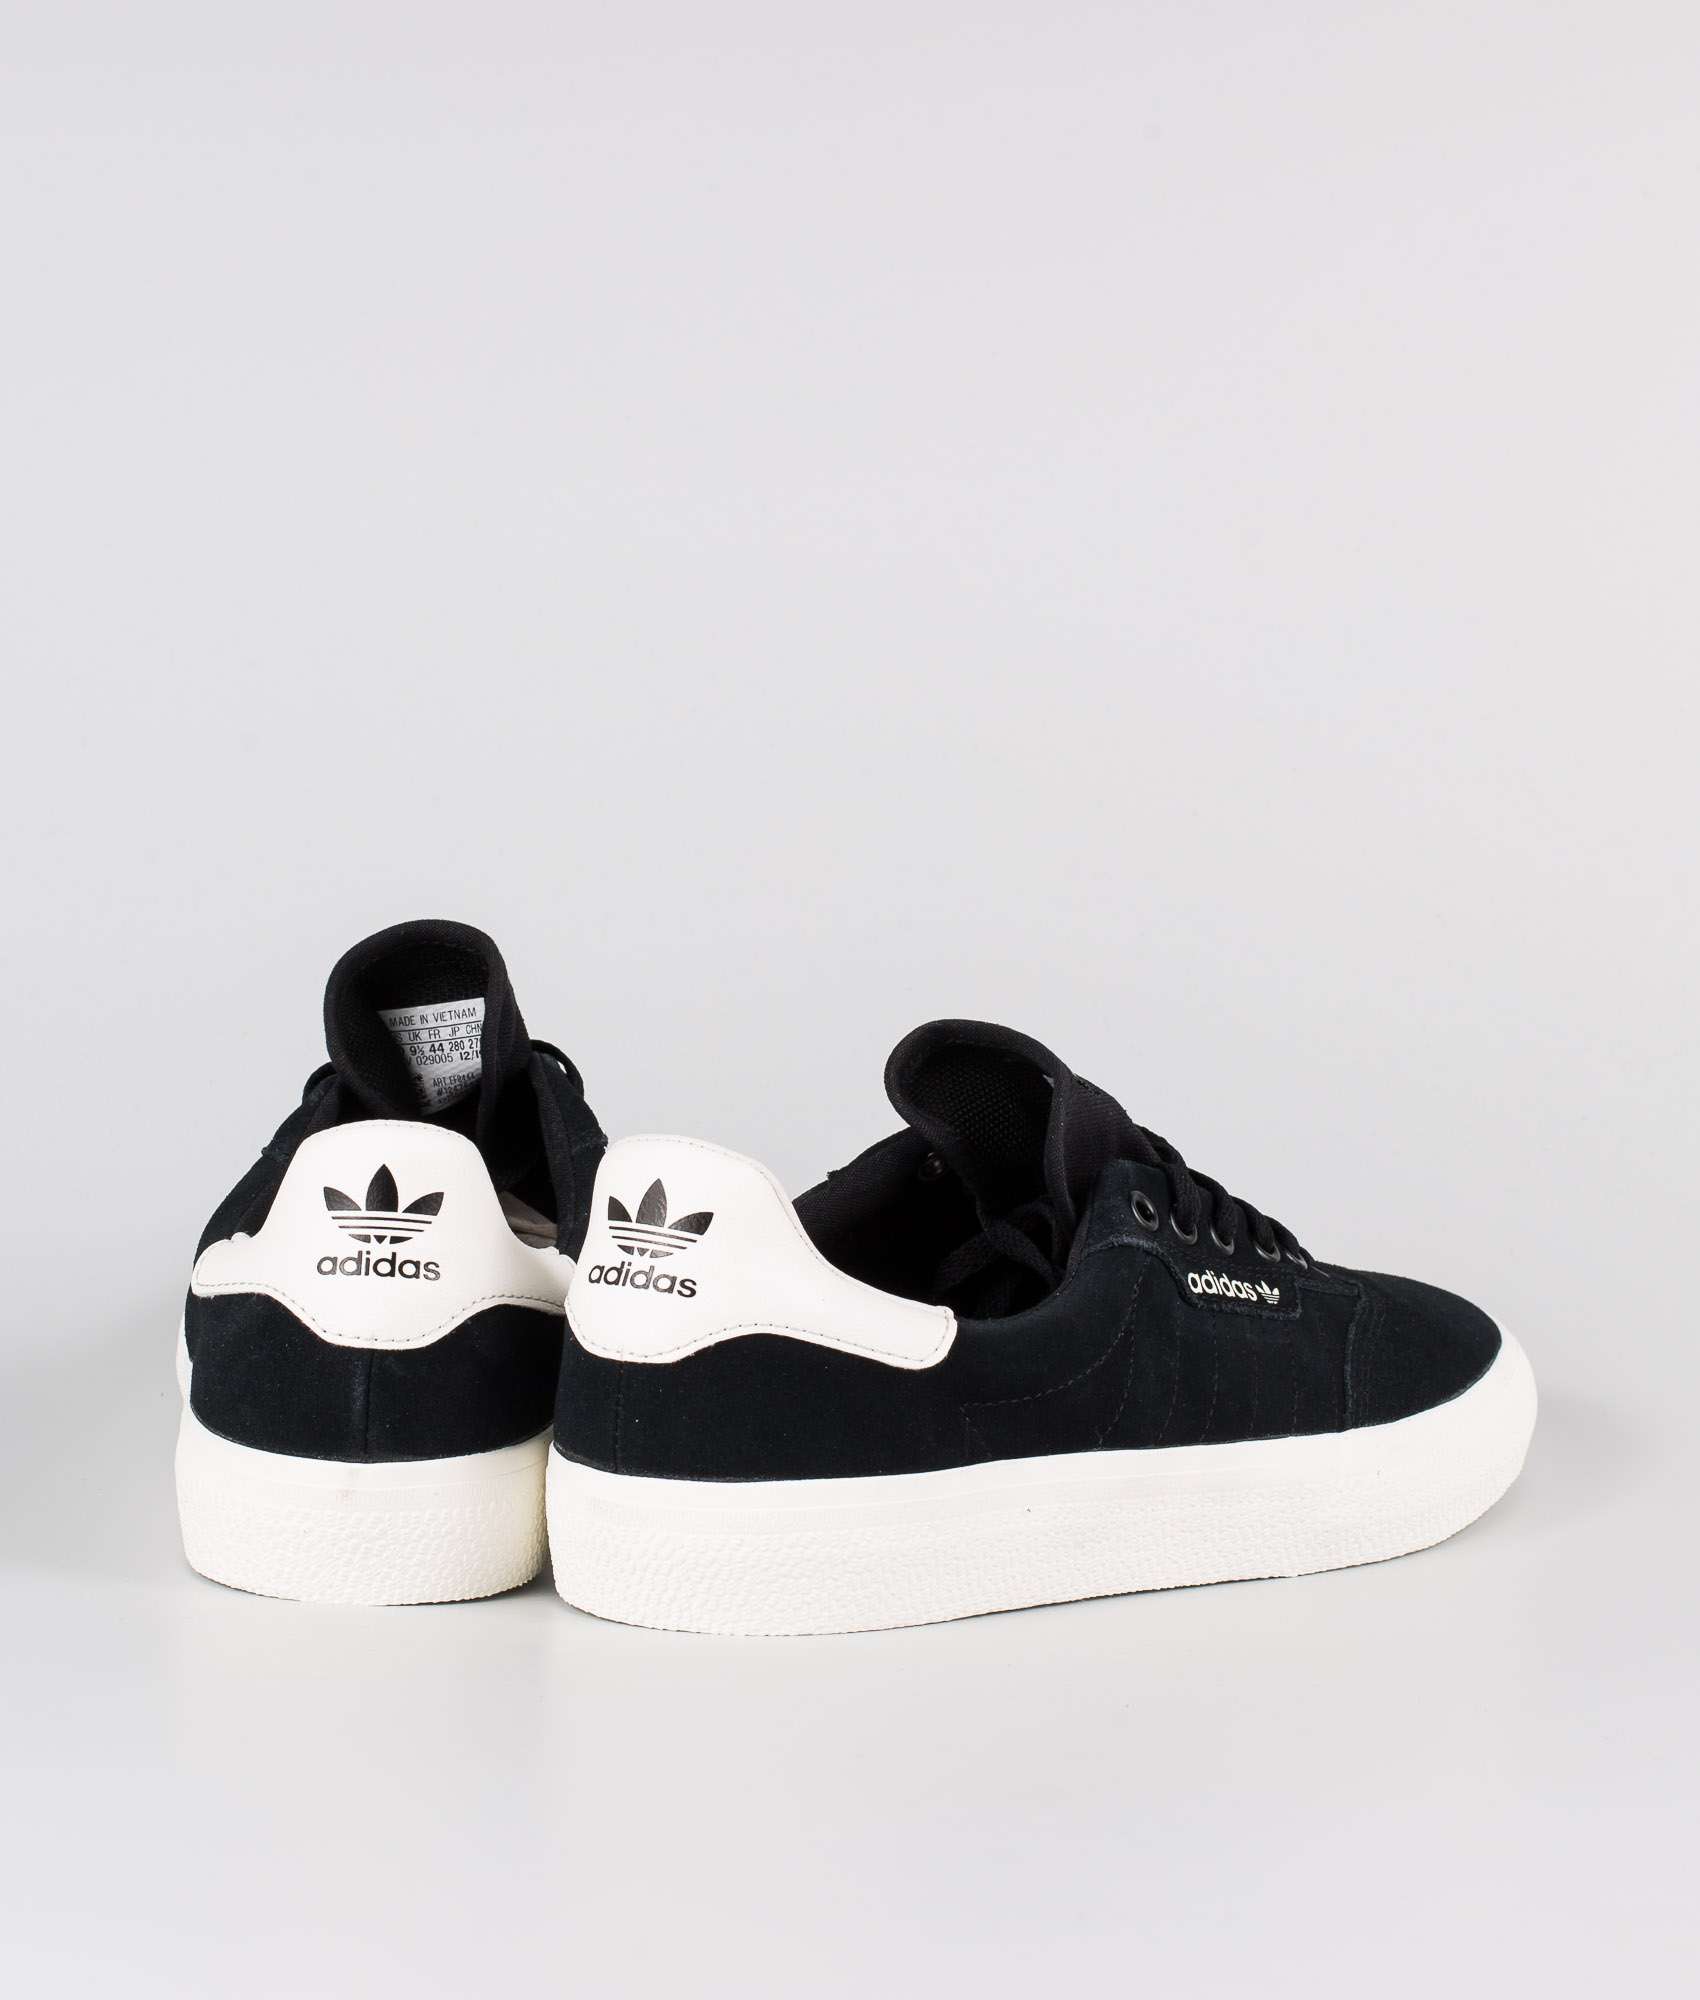 Adidas Skateboarding 3MC Shoes Core BlackCloud WhiteCloud White